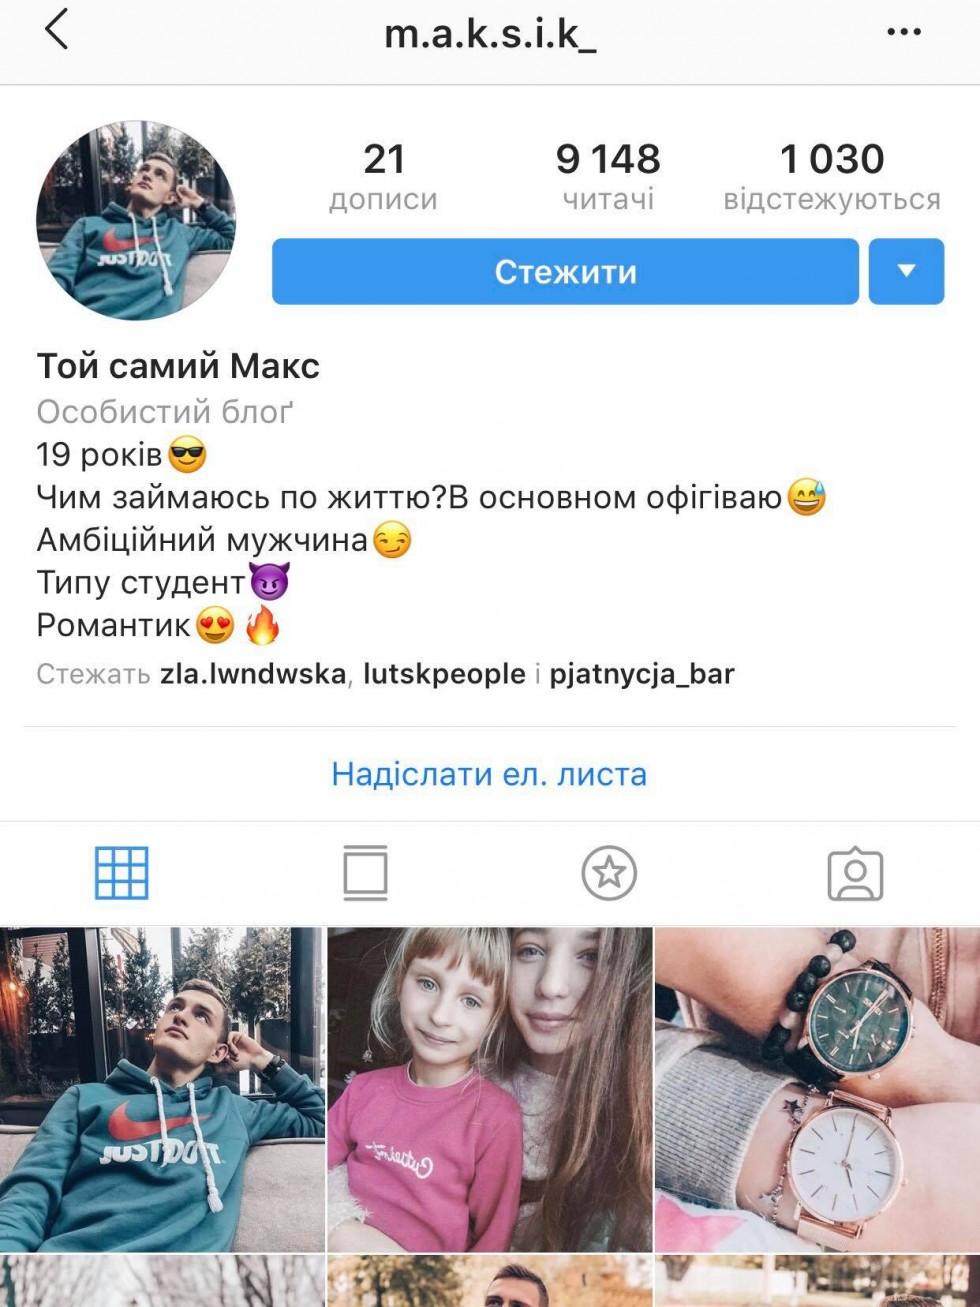 Профіль Максима